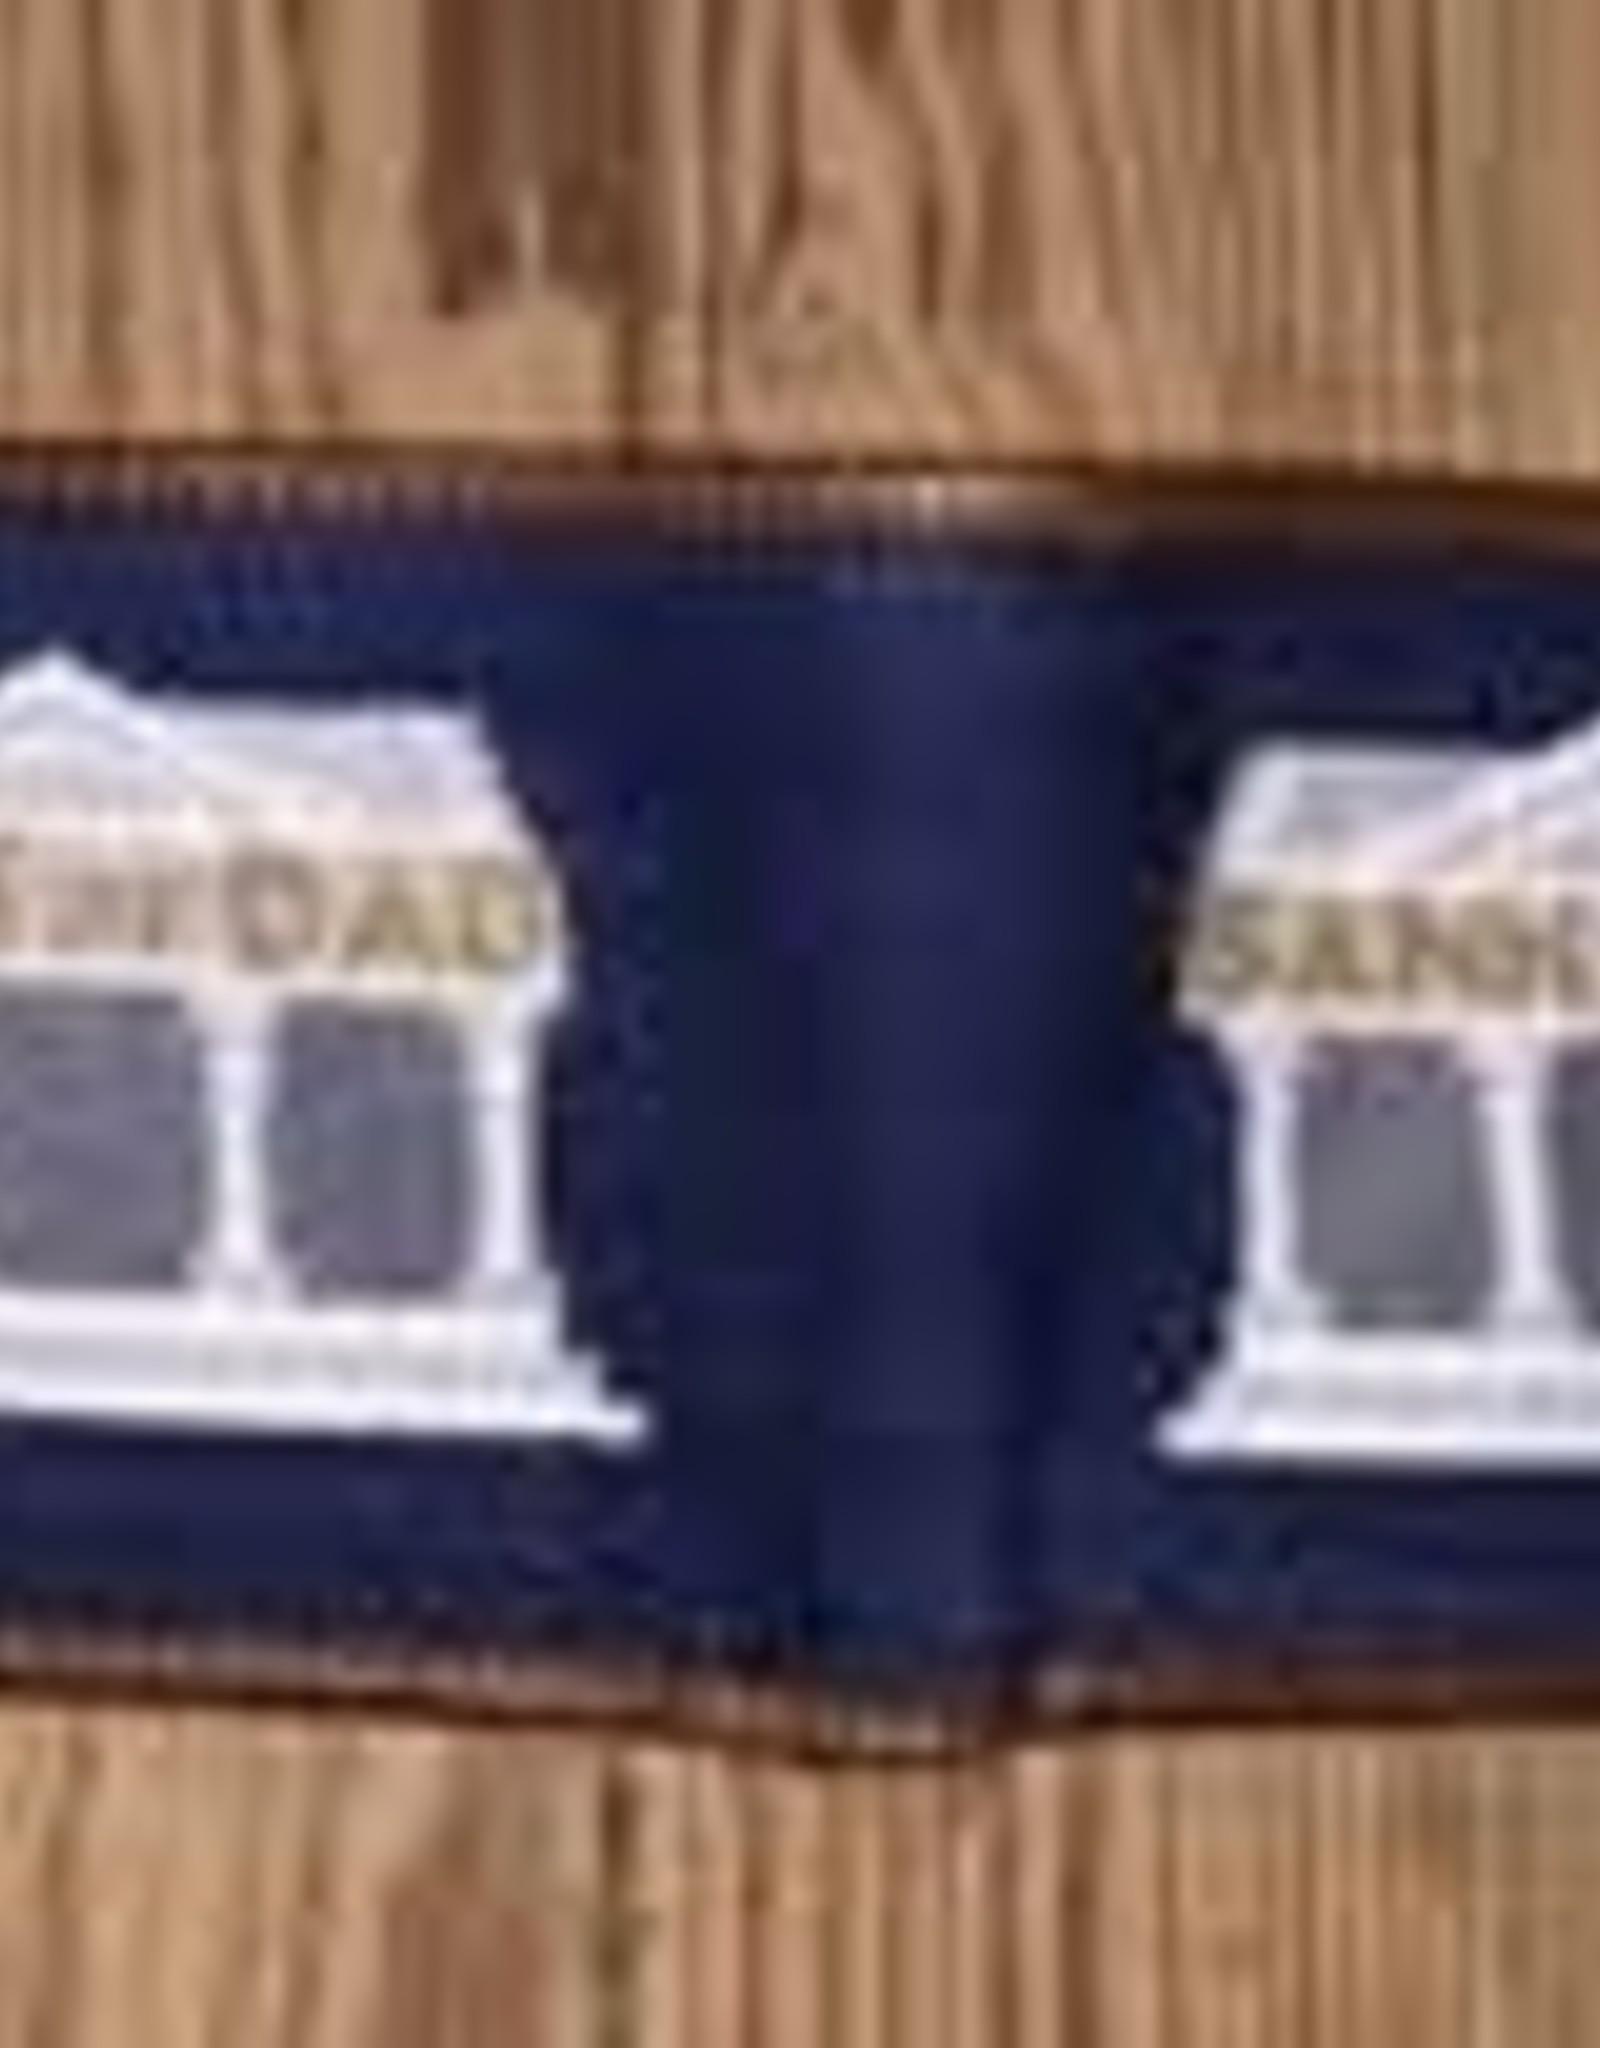 Smathers & Branson Bank of Dad Needlepoint Bi-Fold Wallet